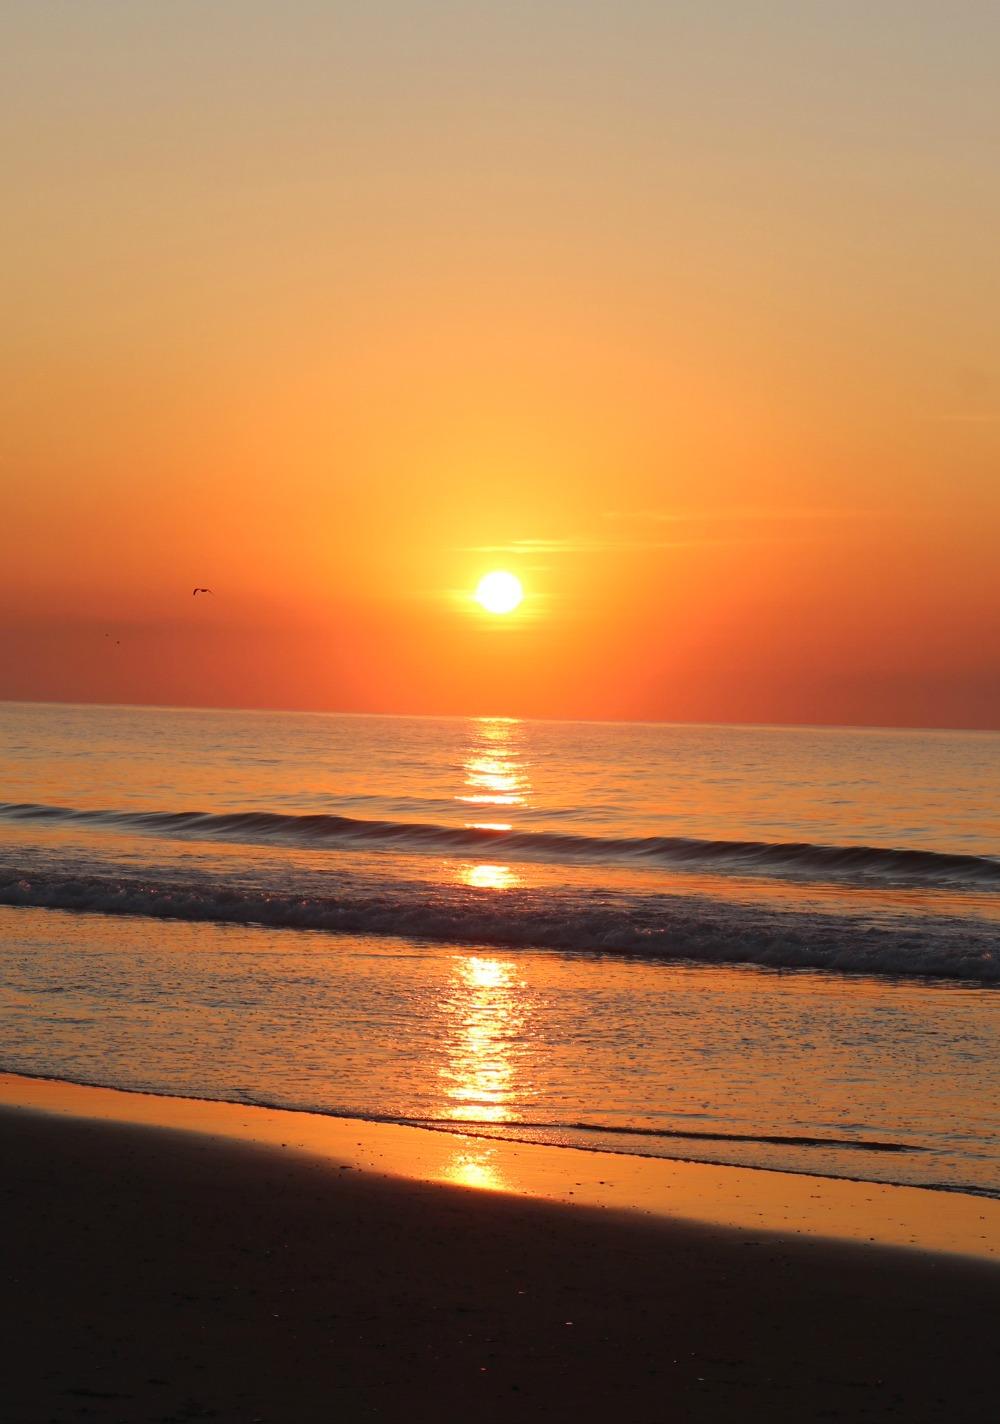 Jersey Shore Photo Diary I Sunrise Over the Atlantic Ocean #Travel #TravelBlogger #TravelPhotography